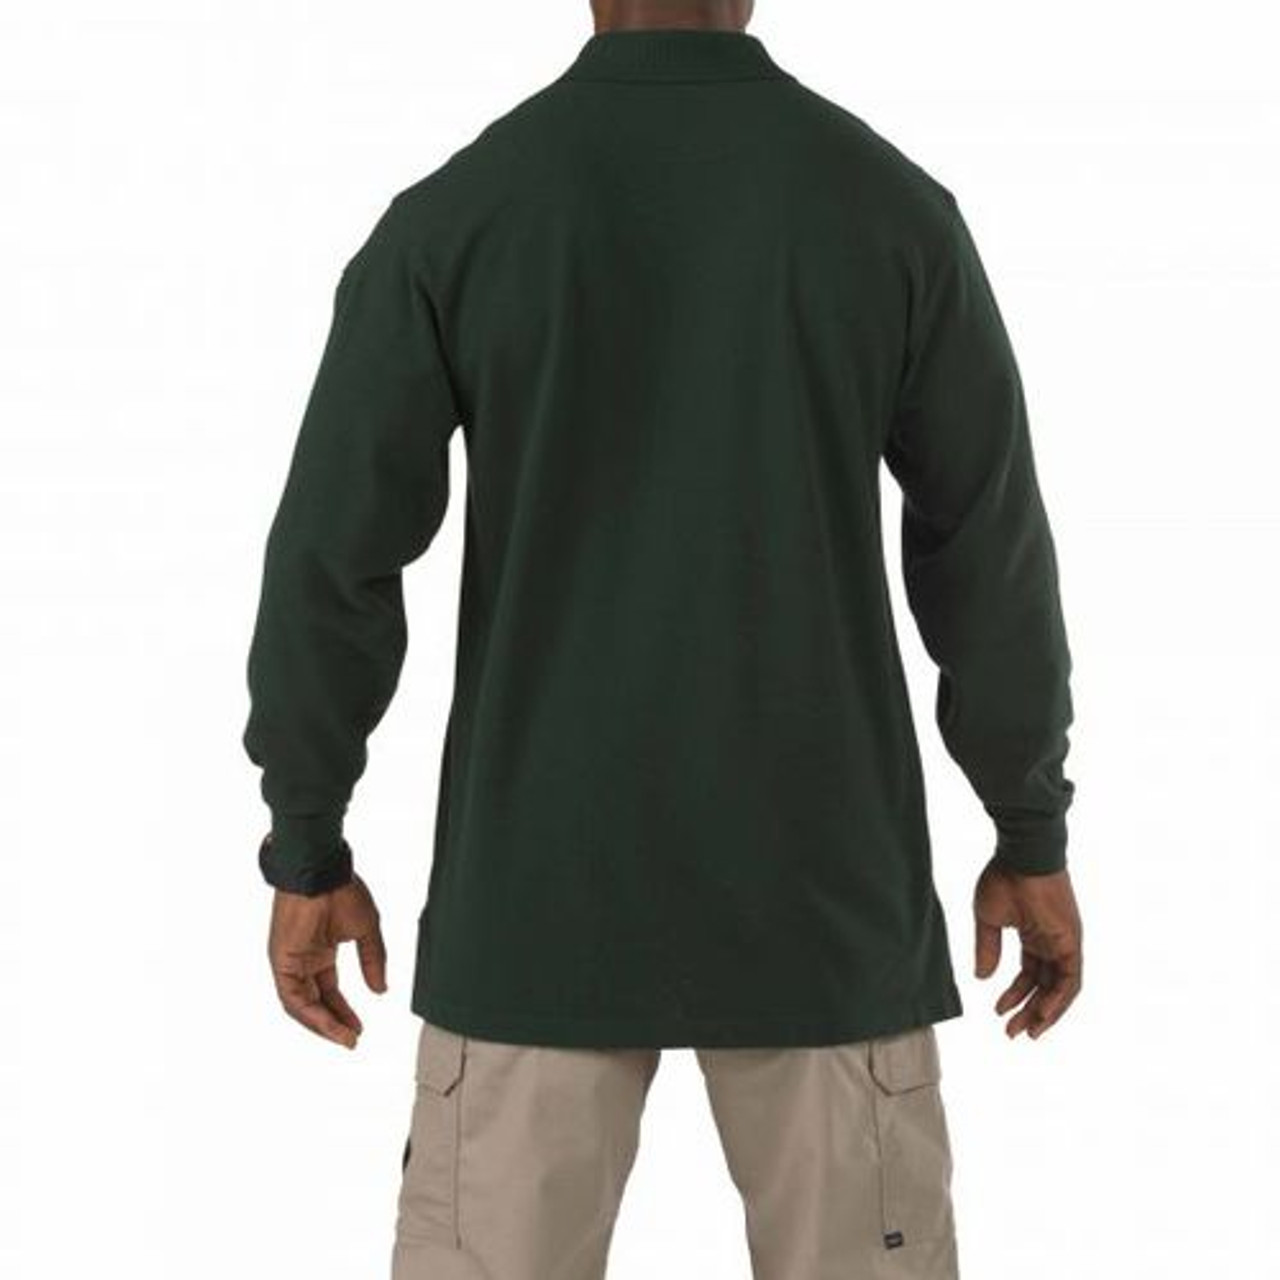 5.11 Tactical 42056 Men's Professional, Long Sleeve Casual or Uniform Polo Shirt, Cotton